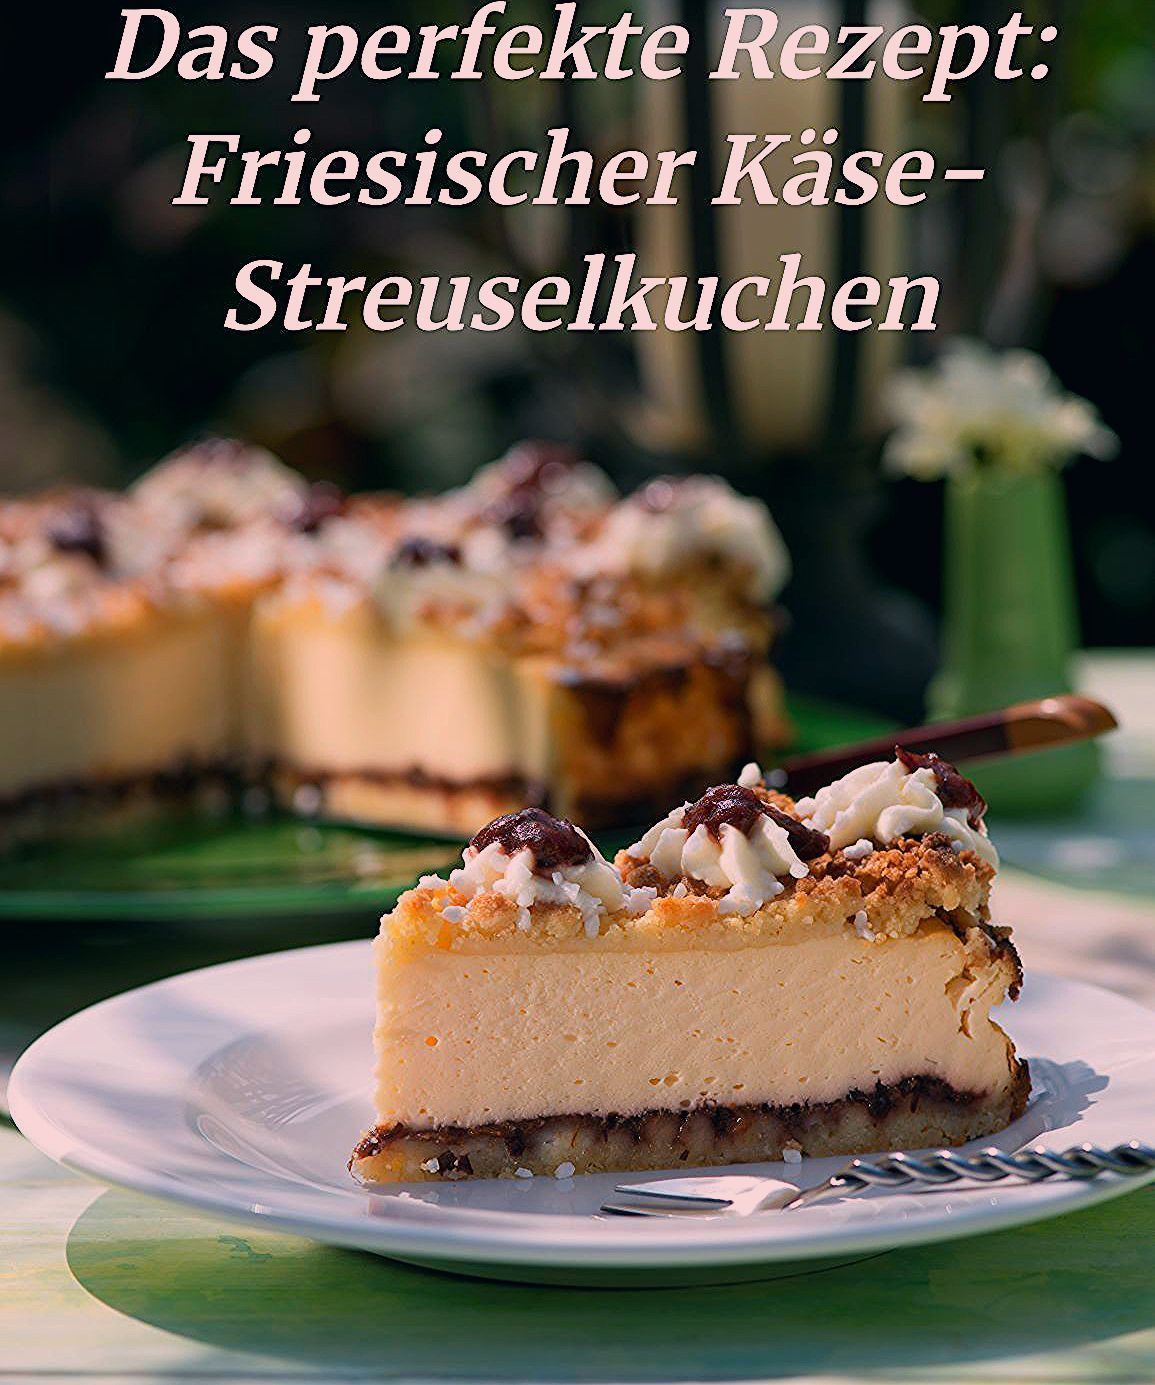 Photo of Friesischer Käse-Streuselkuchen